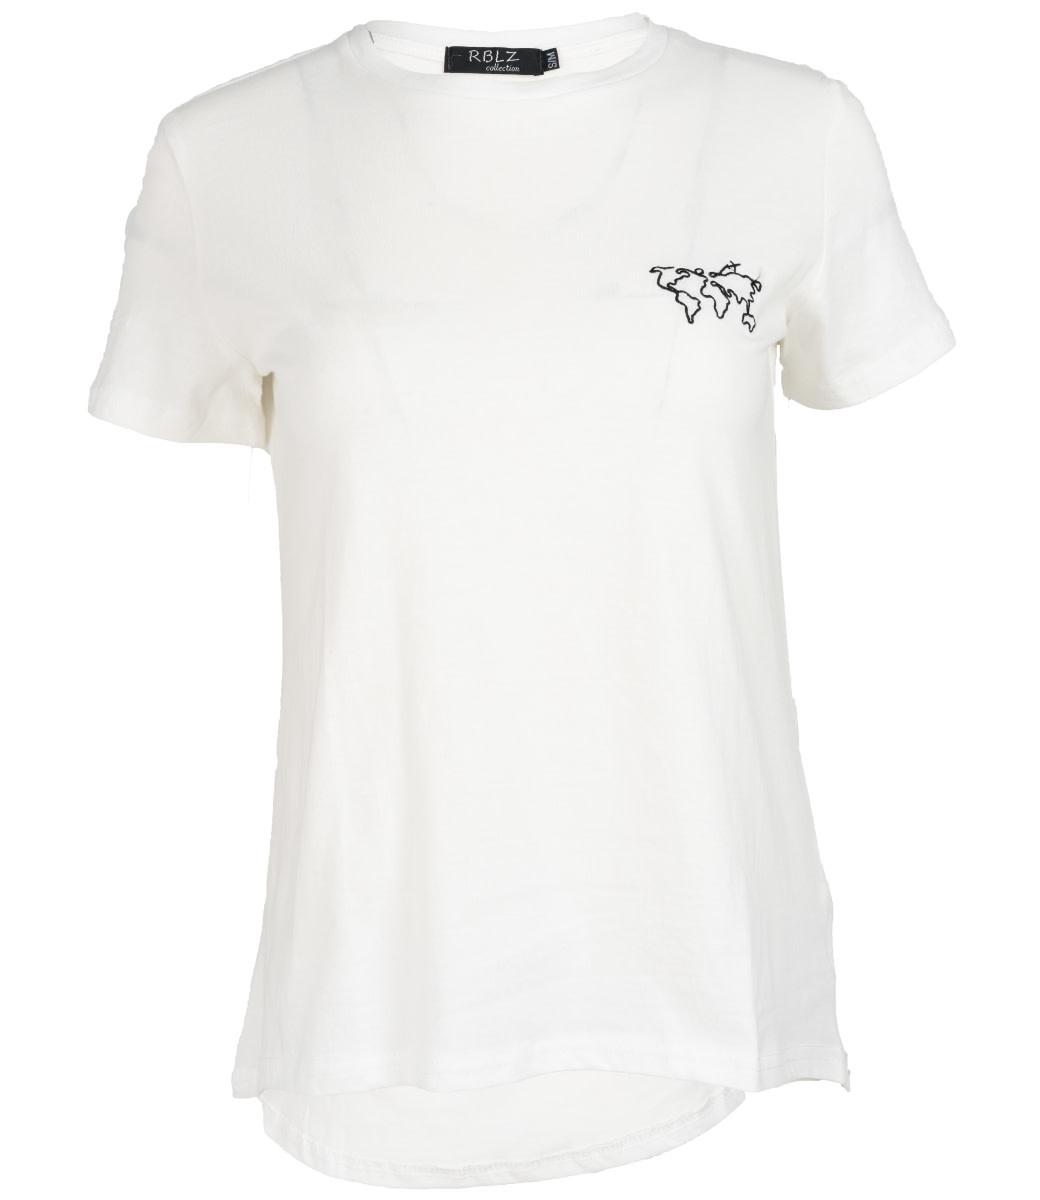 Rebelz Collection Shirt wit/zwart world